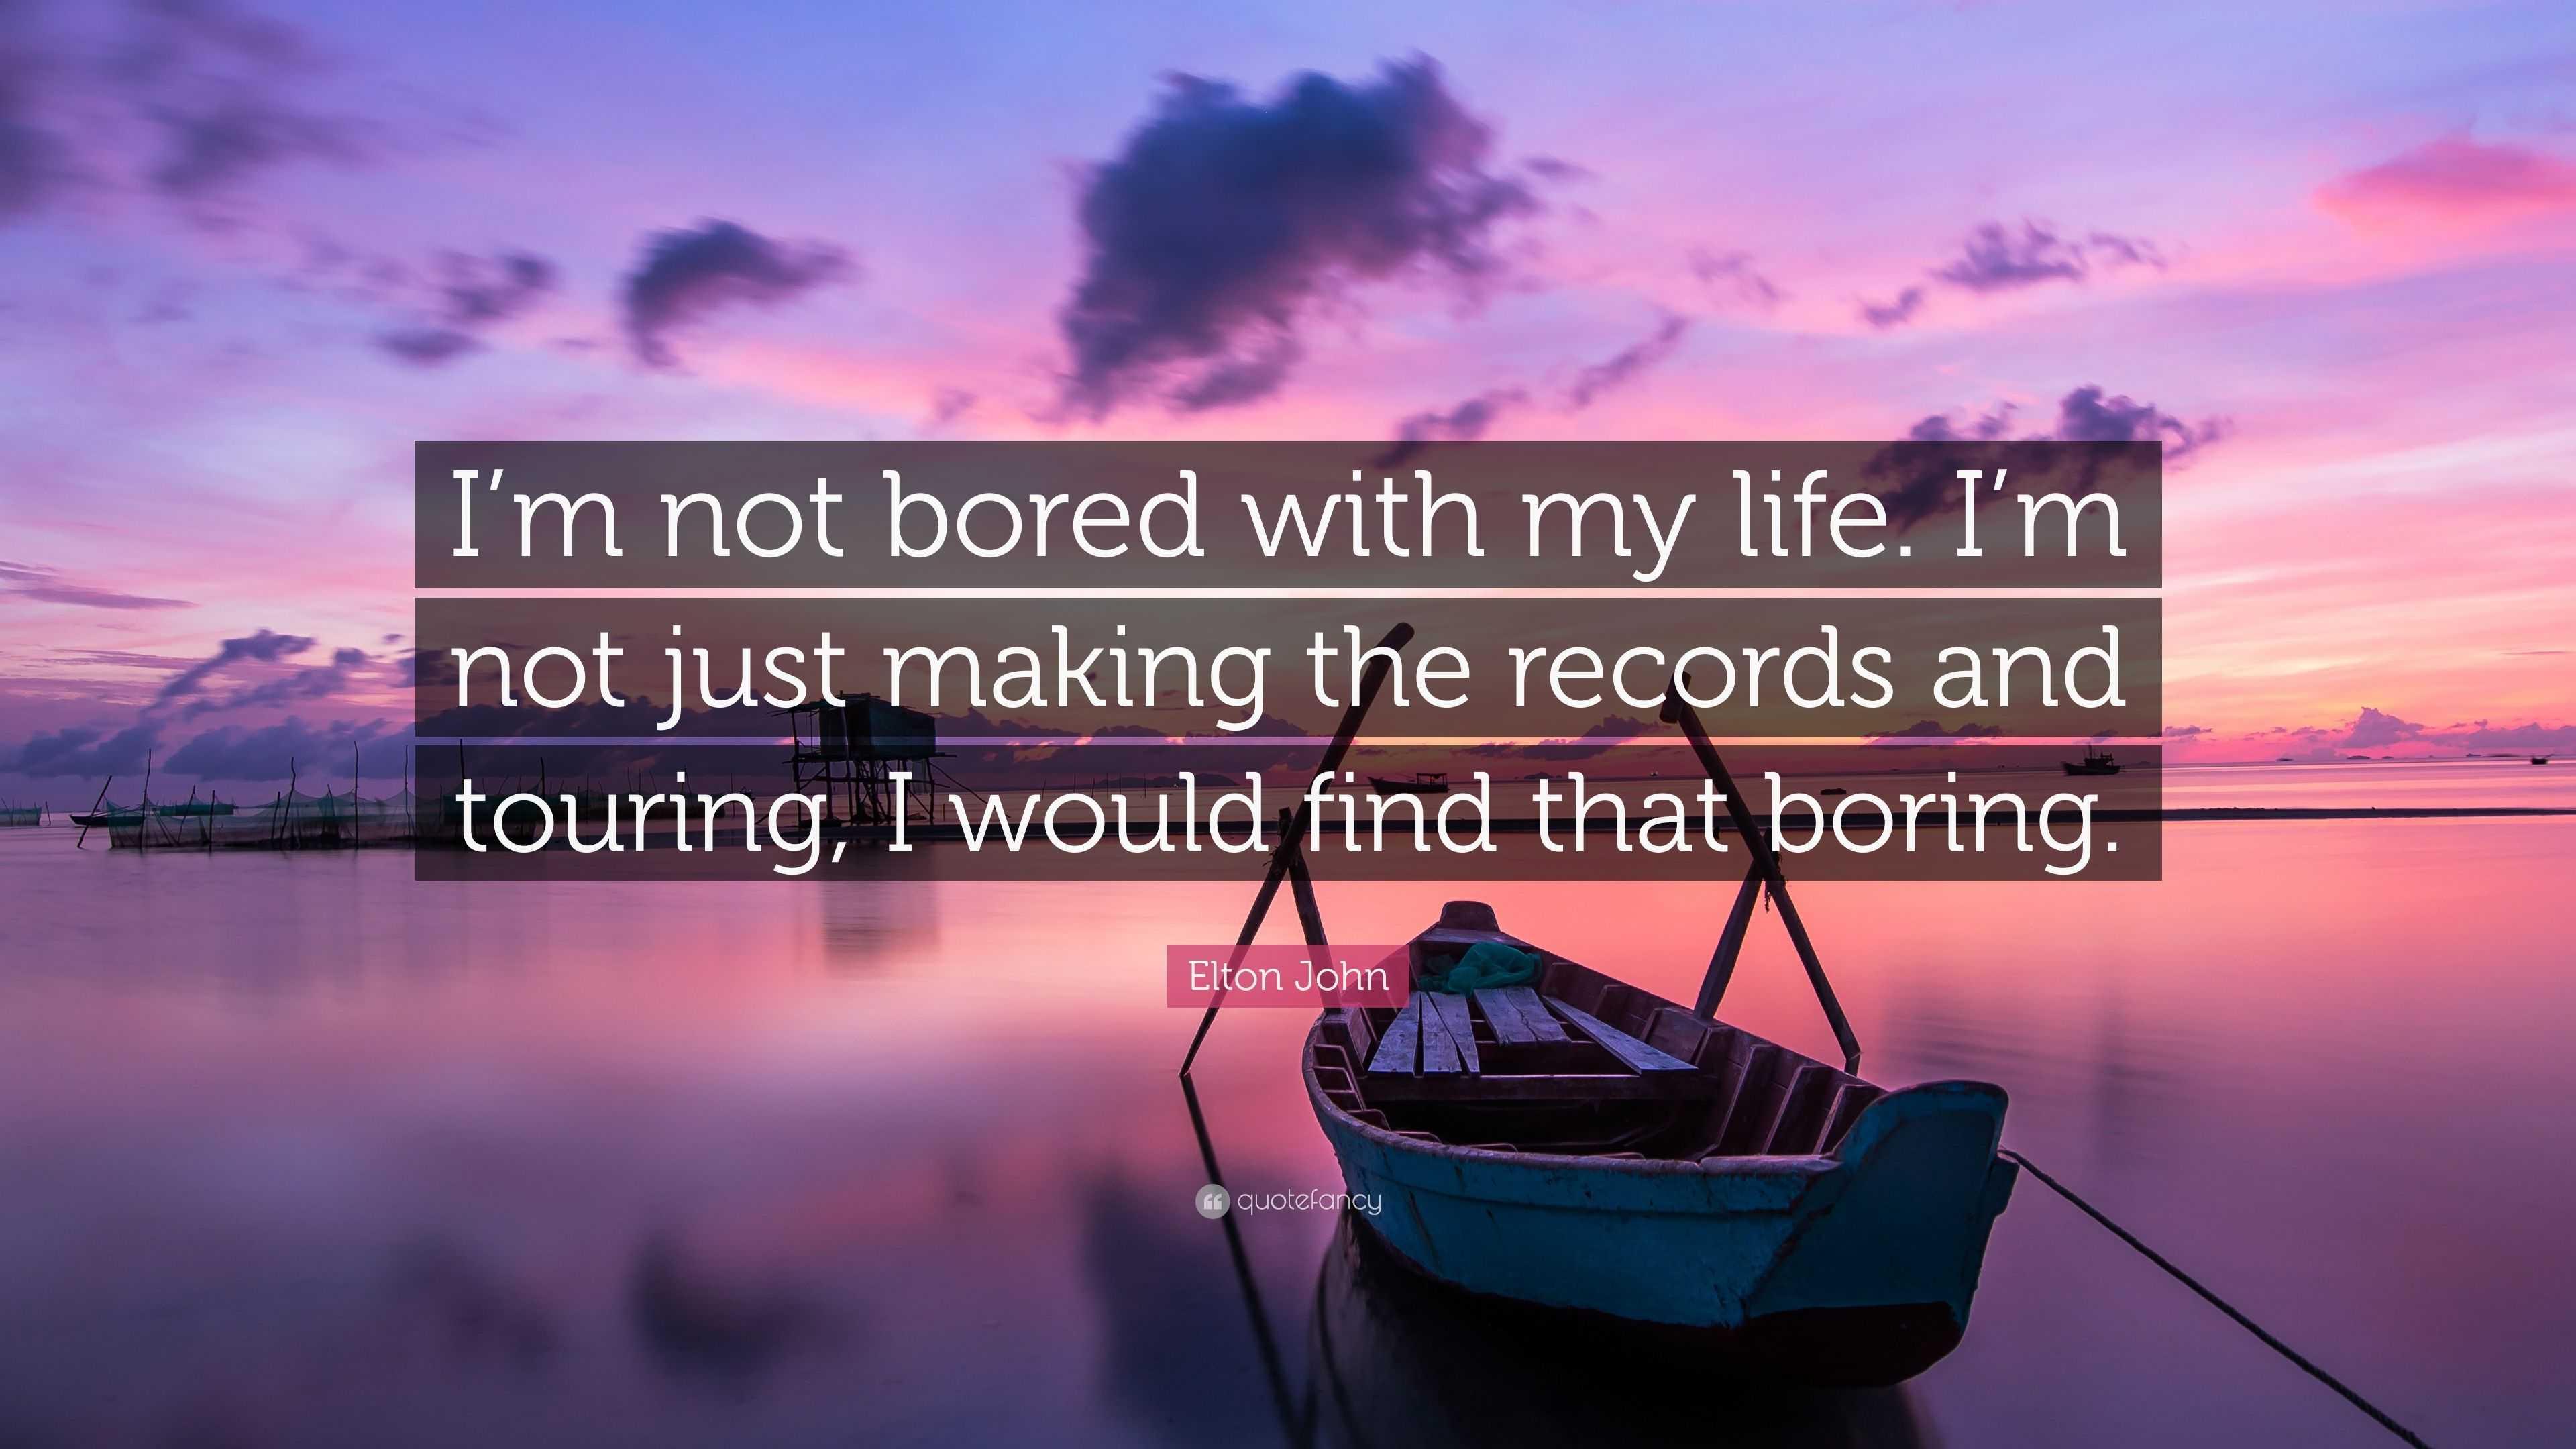 i find life boring